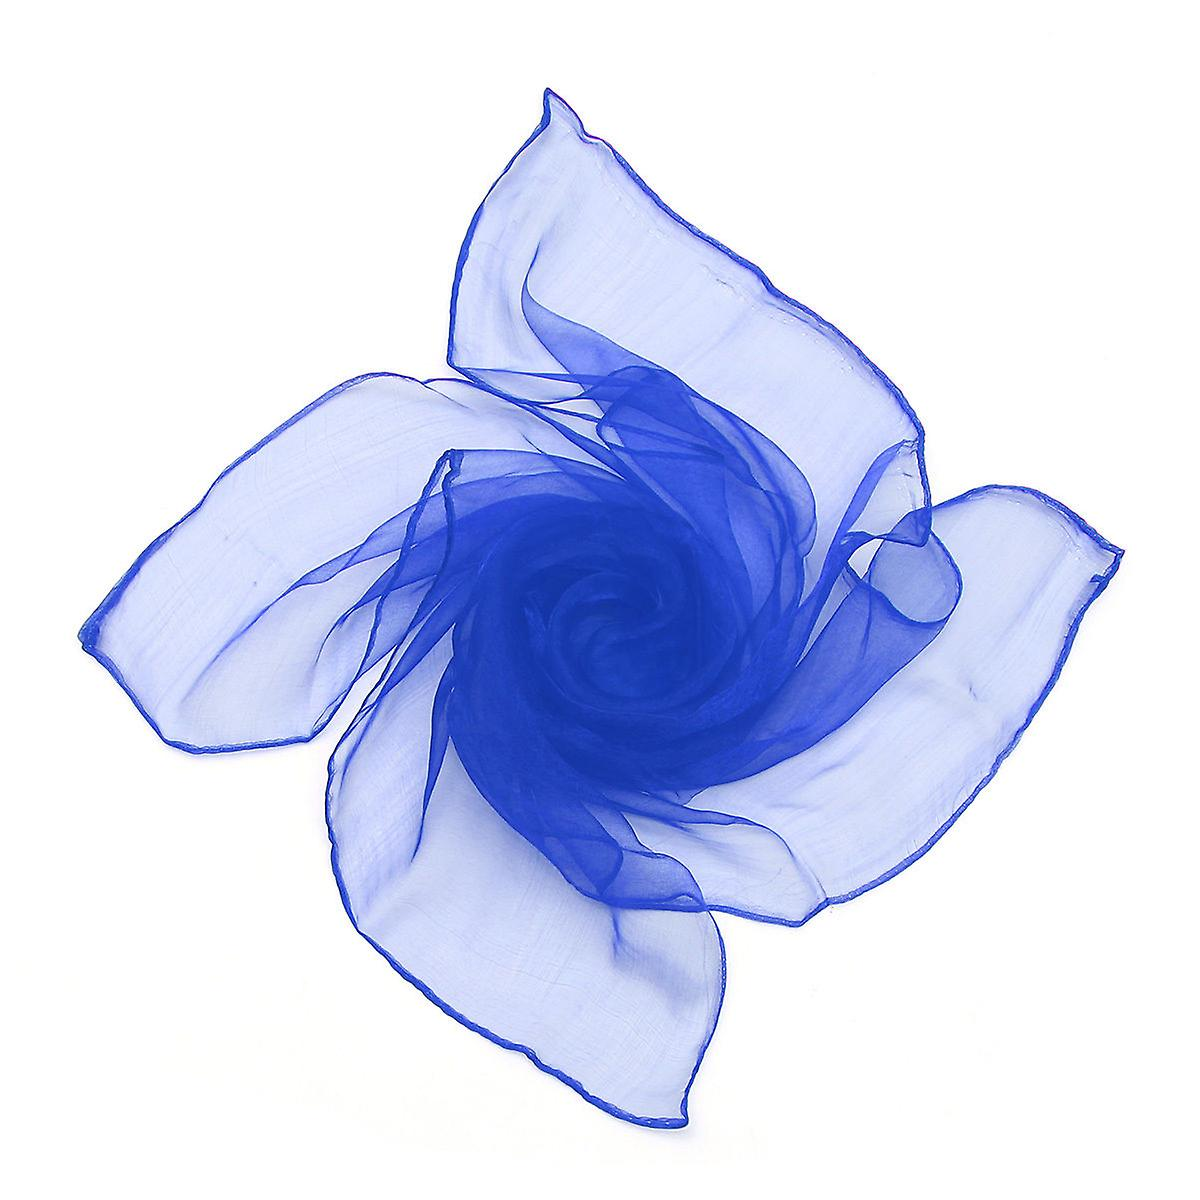 1950's Plain Square Chiffon 50's Neck 4 Seasons Scarf Wrap 65cm x 65cm - Blue